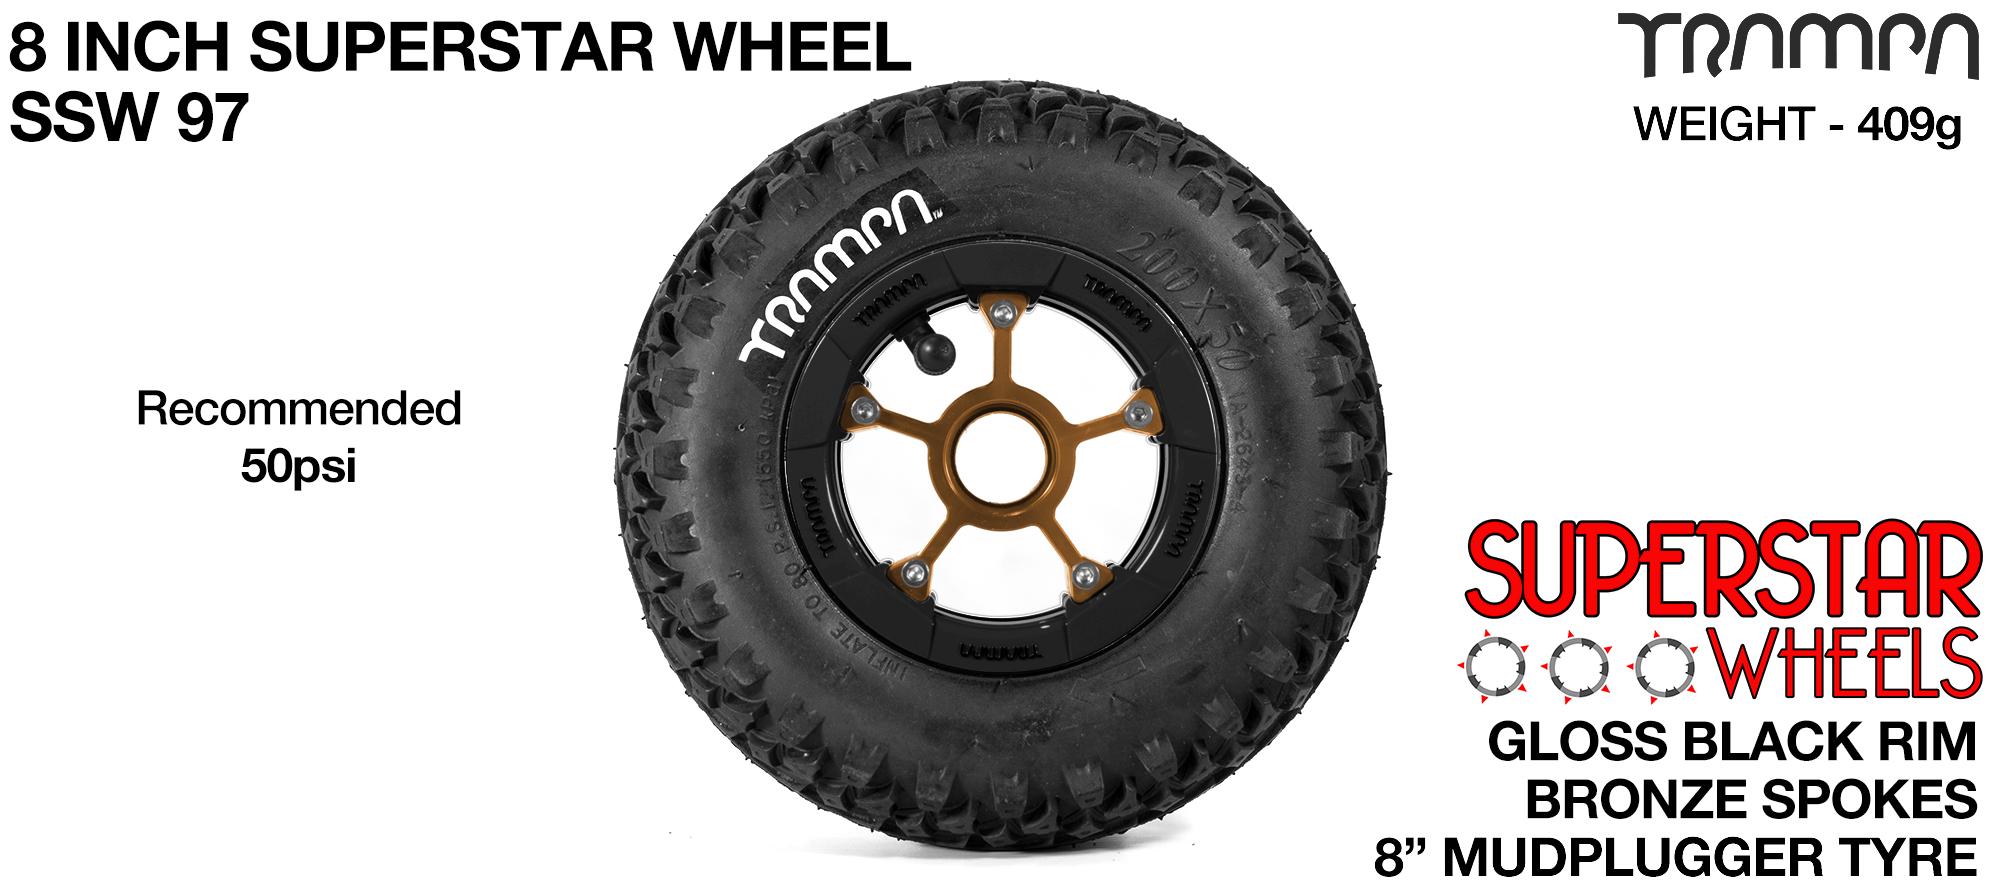 Superstar 8 inch wheel -  Black Gloss Rim Bronze Anodised Spokes & Mud Plugger 8 Inch Tyre